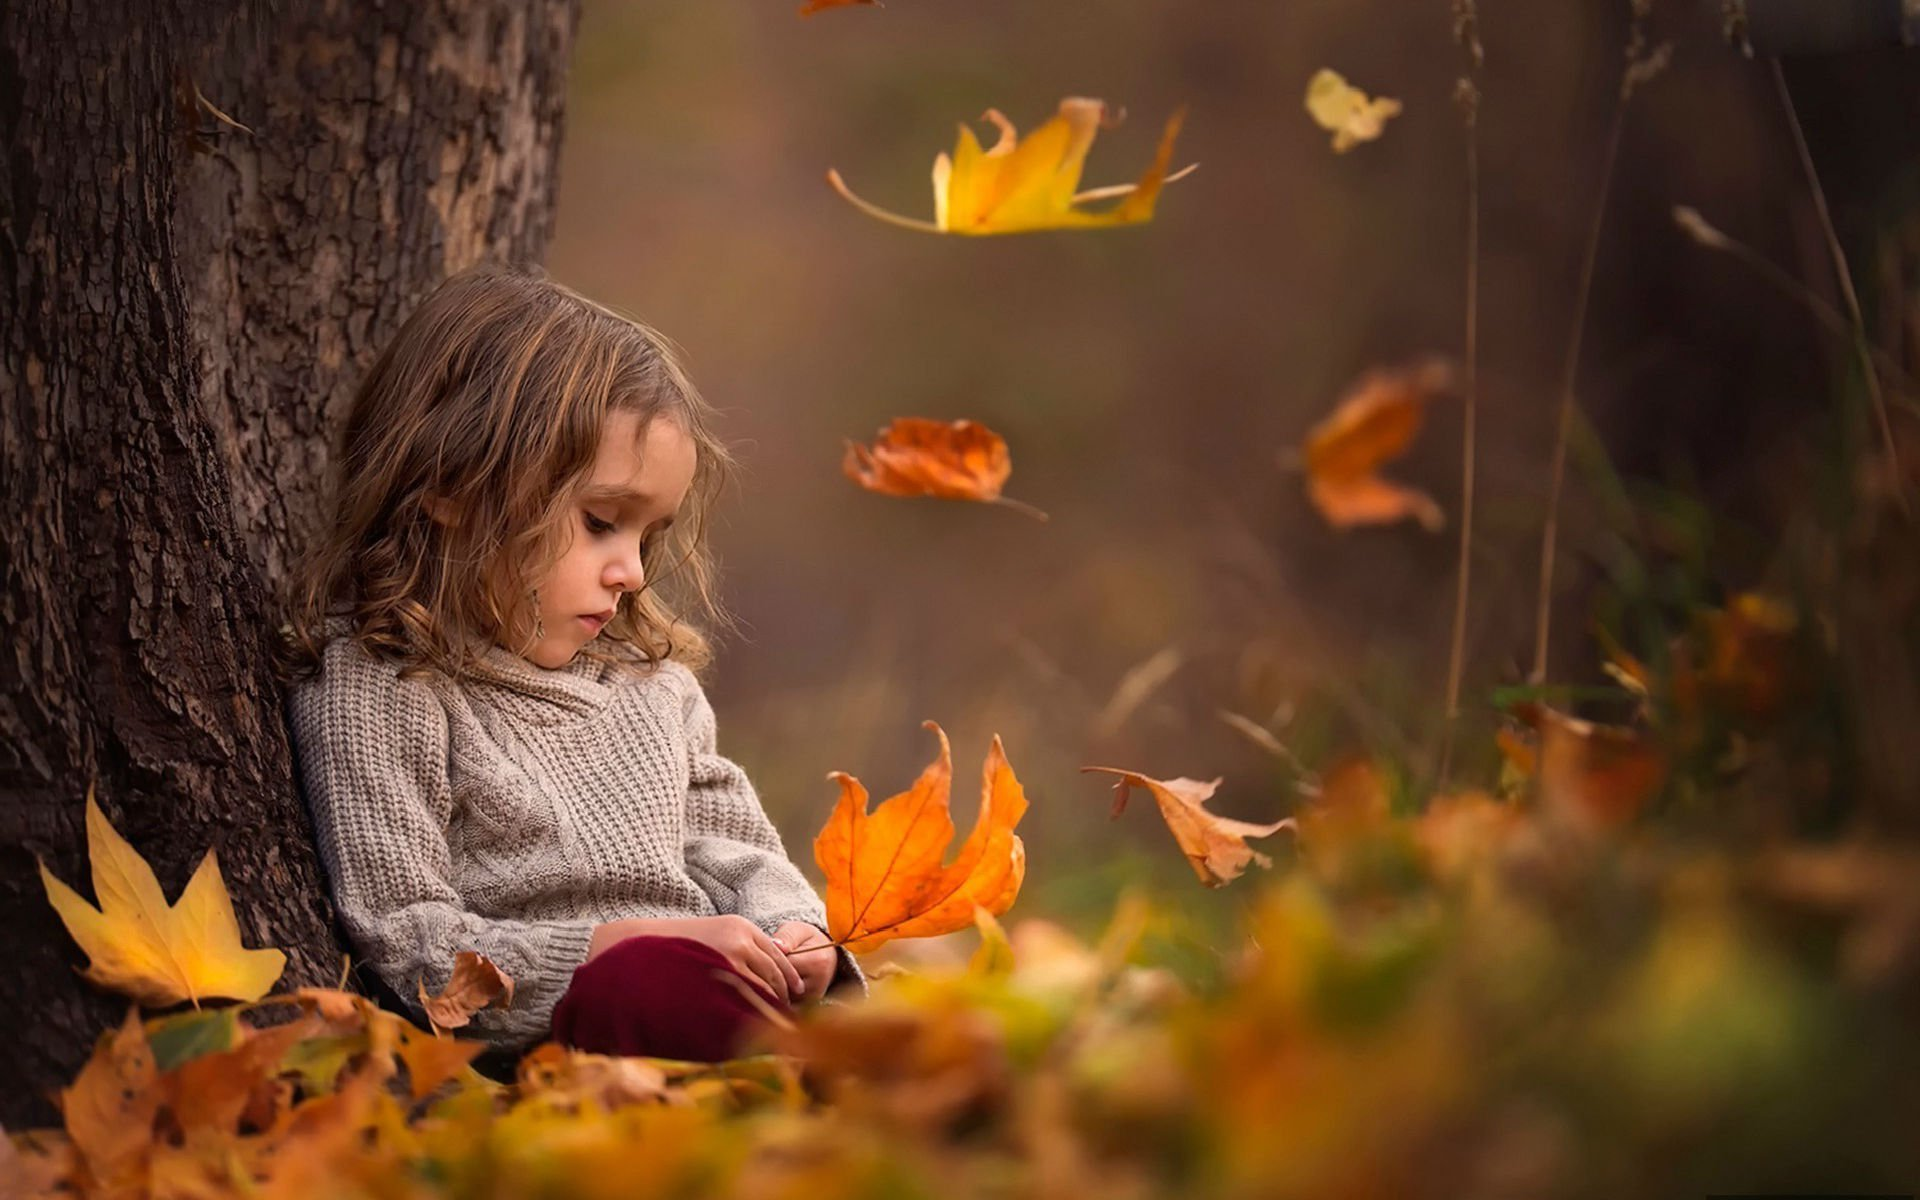 Depression Sad Mood Sorrow Dark People Love Autumn Baby